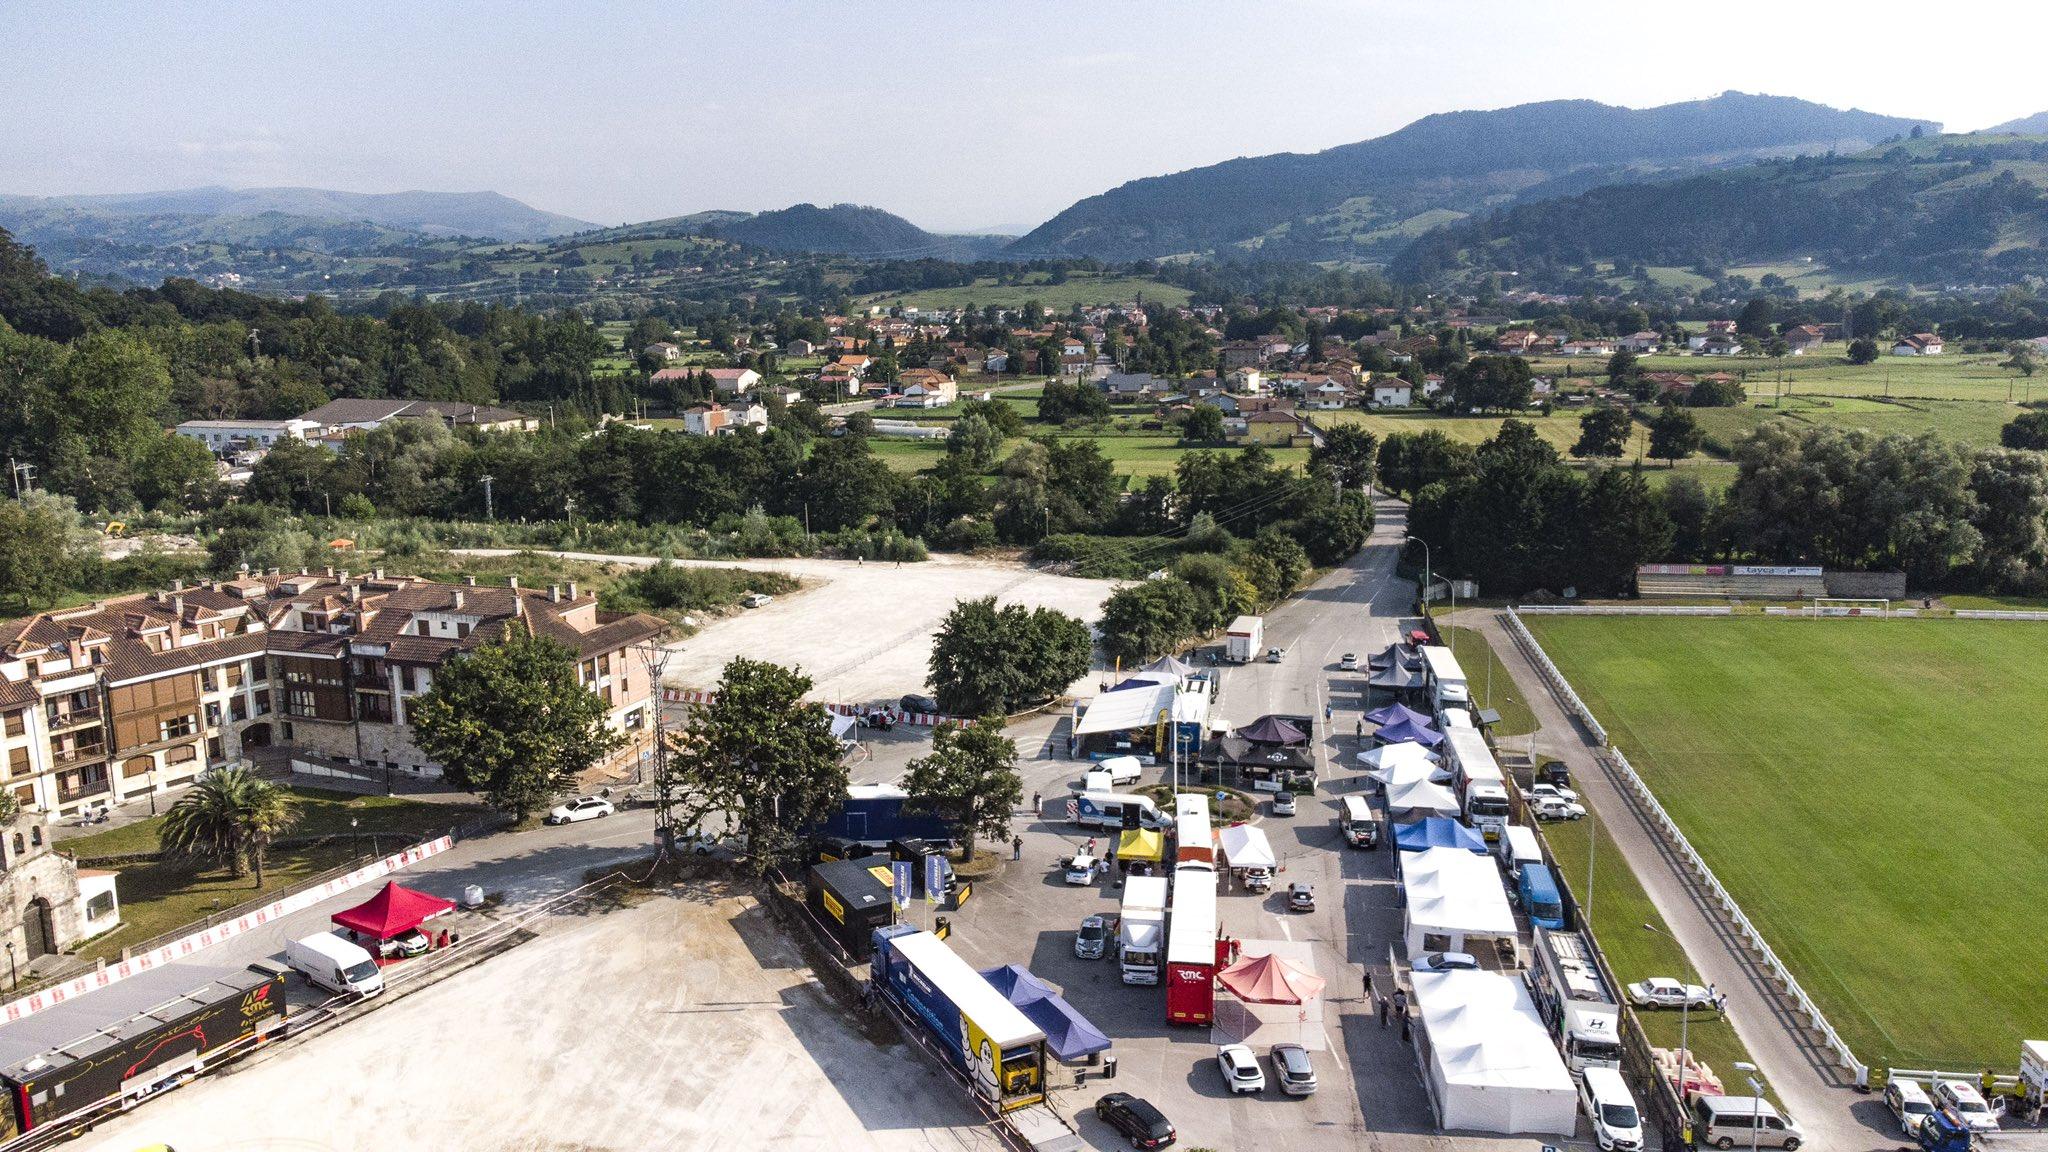 CERA: 14º Rallye Blendio - Cristian López - Trofeo Cantabria Deporte [27-28 Agosto] E9zLGEpXoAE2Bzz?format=jpg&name=large